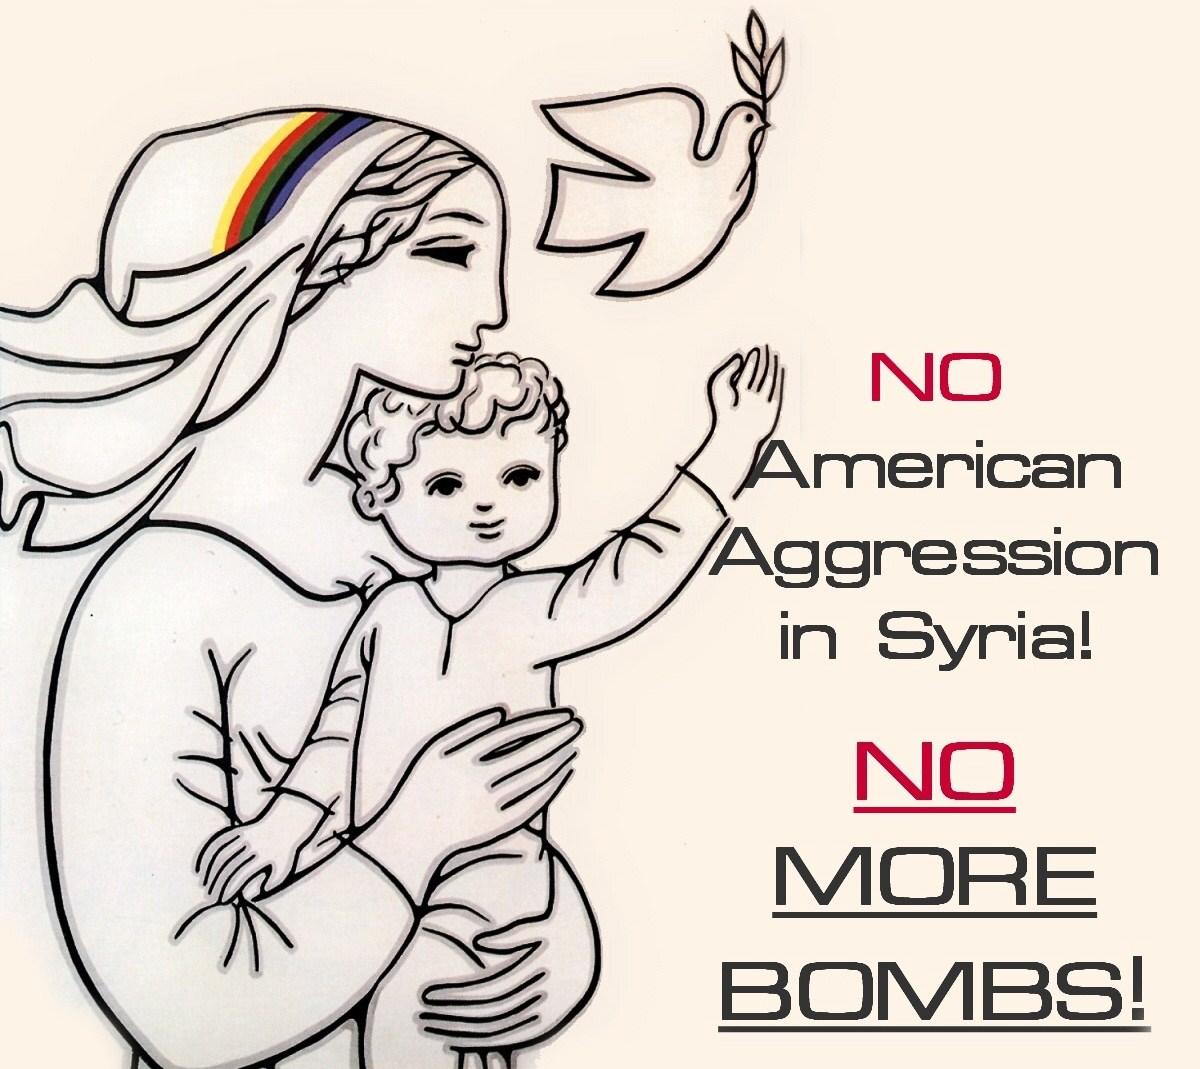 Afbeeldingsresultaat voor UN peace process for Syria fac rose cartoon